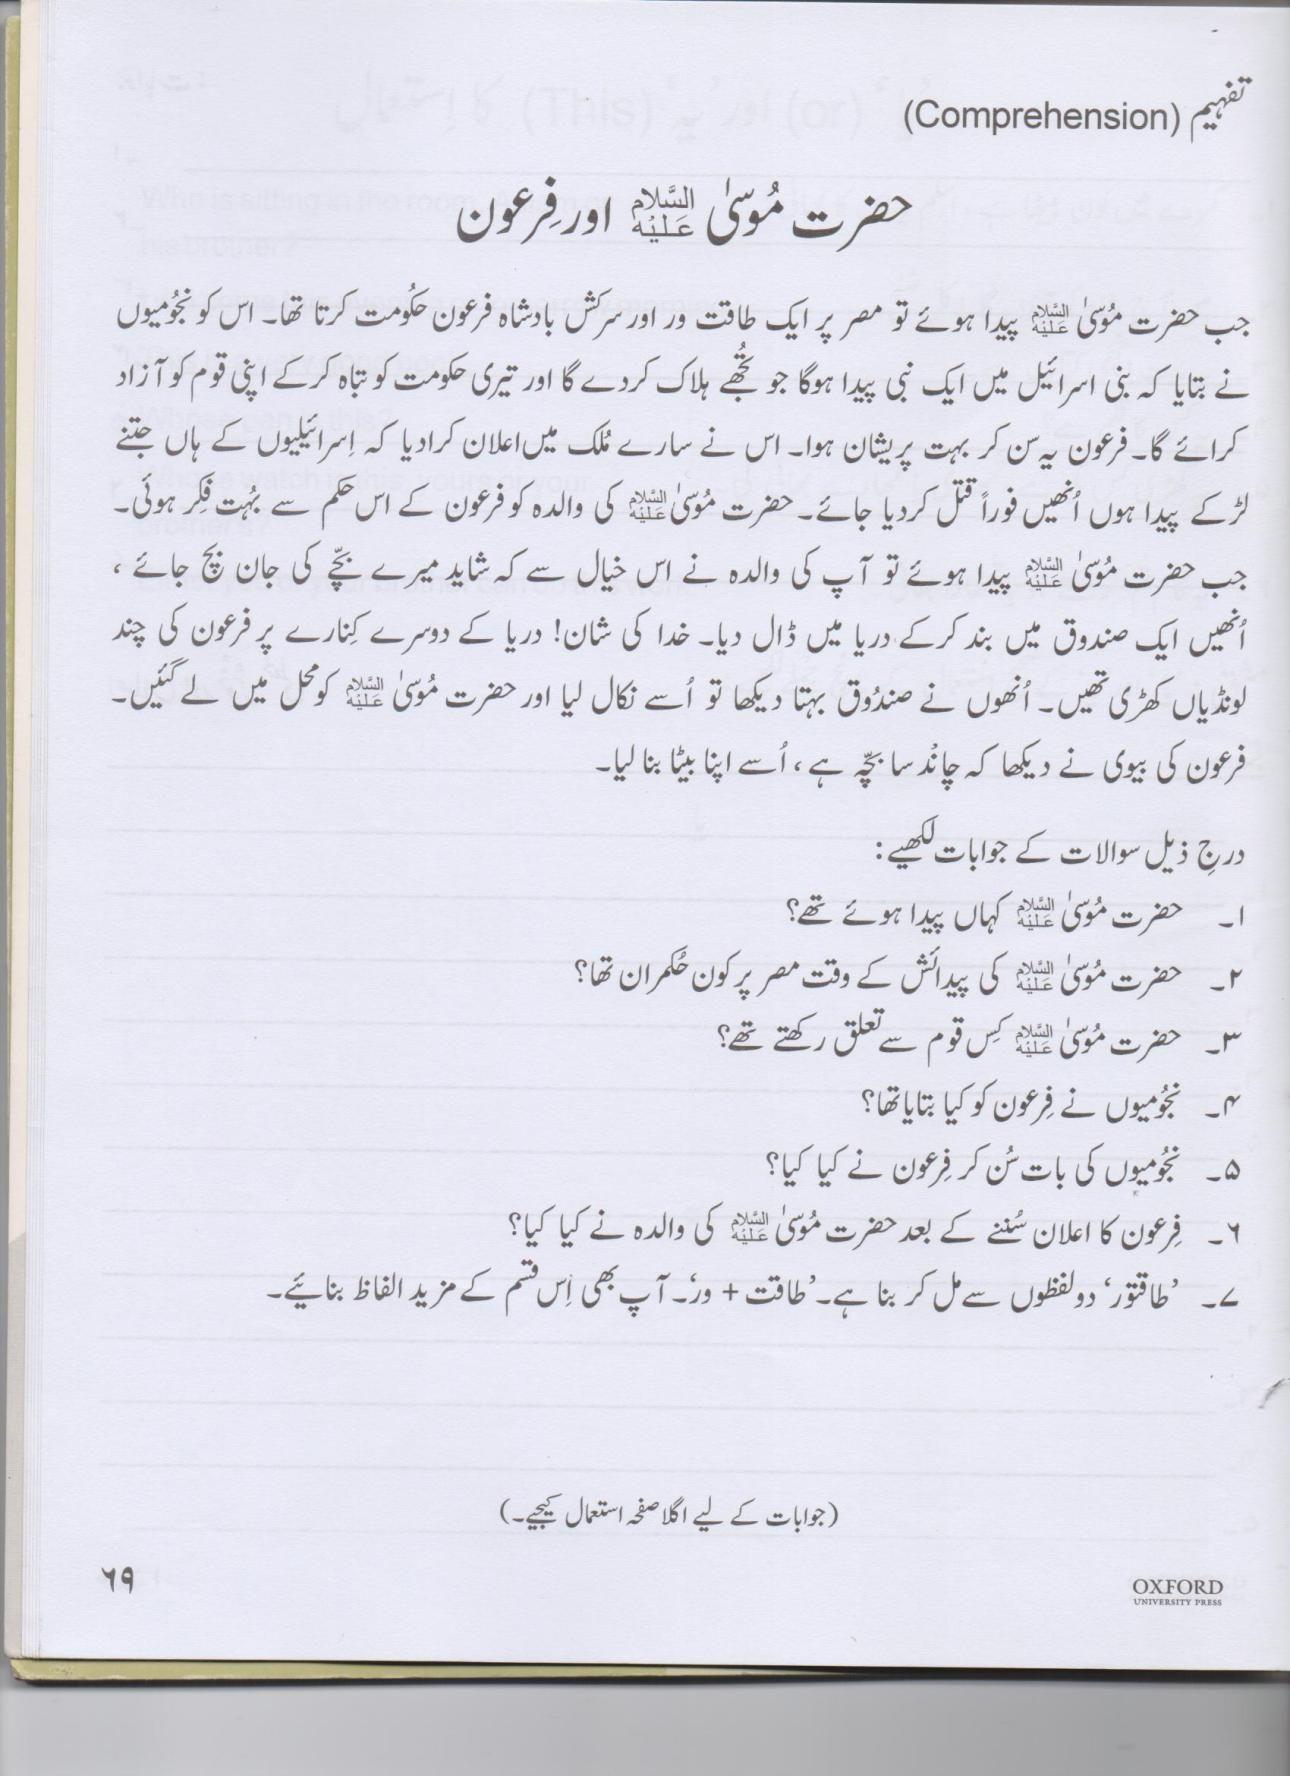 Urdu Blog Worksheet Class 4 10 11 16 Comprehension Worksheets 3rd Grade Math Worksheets 2nd Grade Worksheets